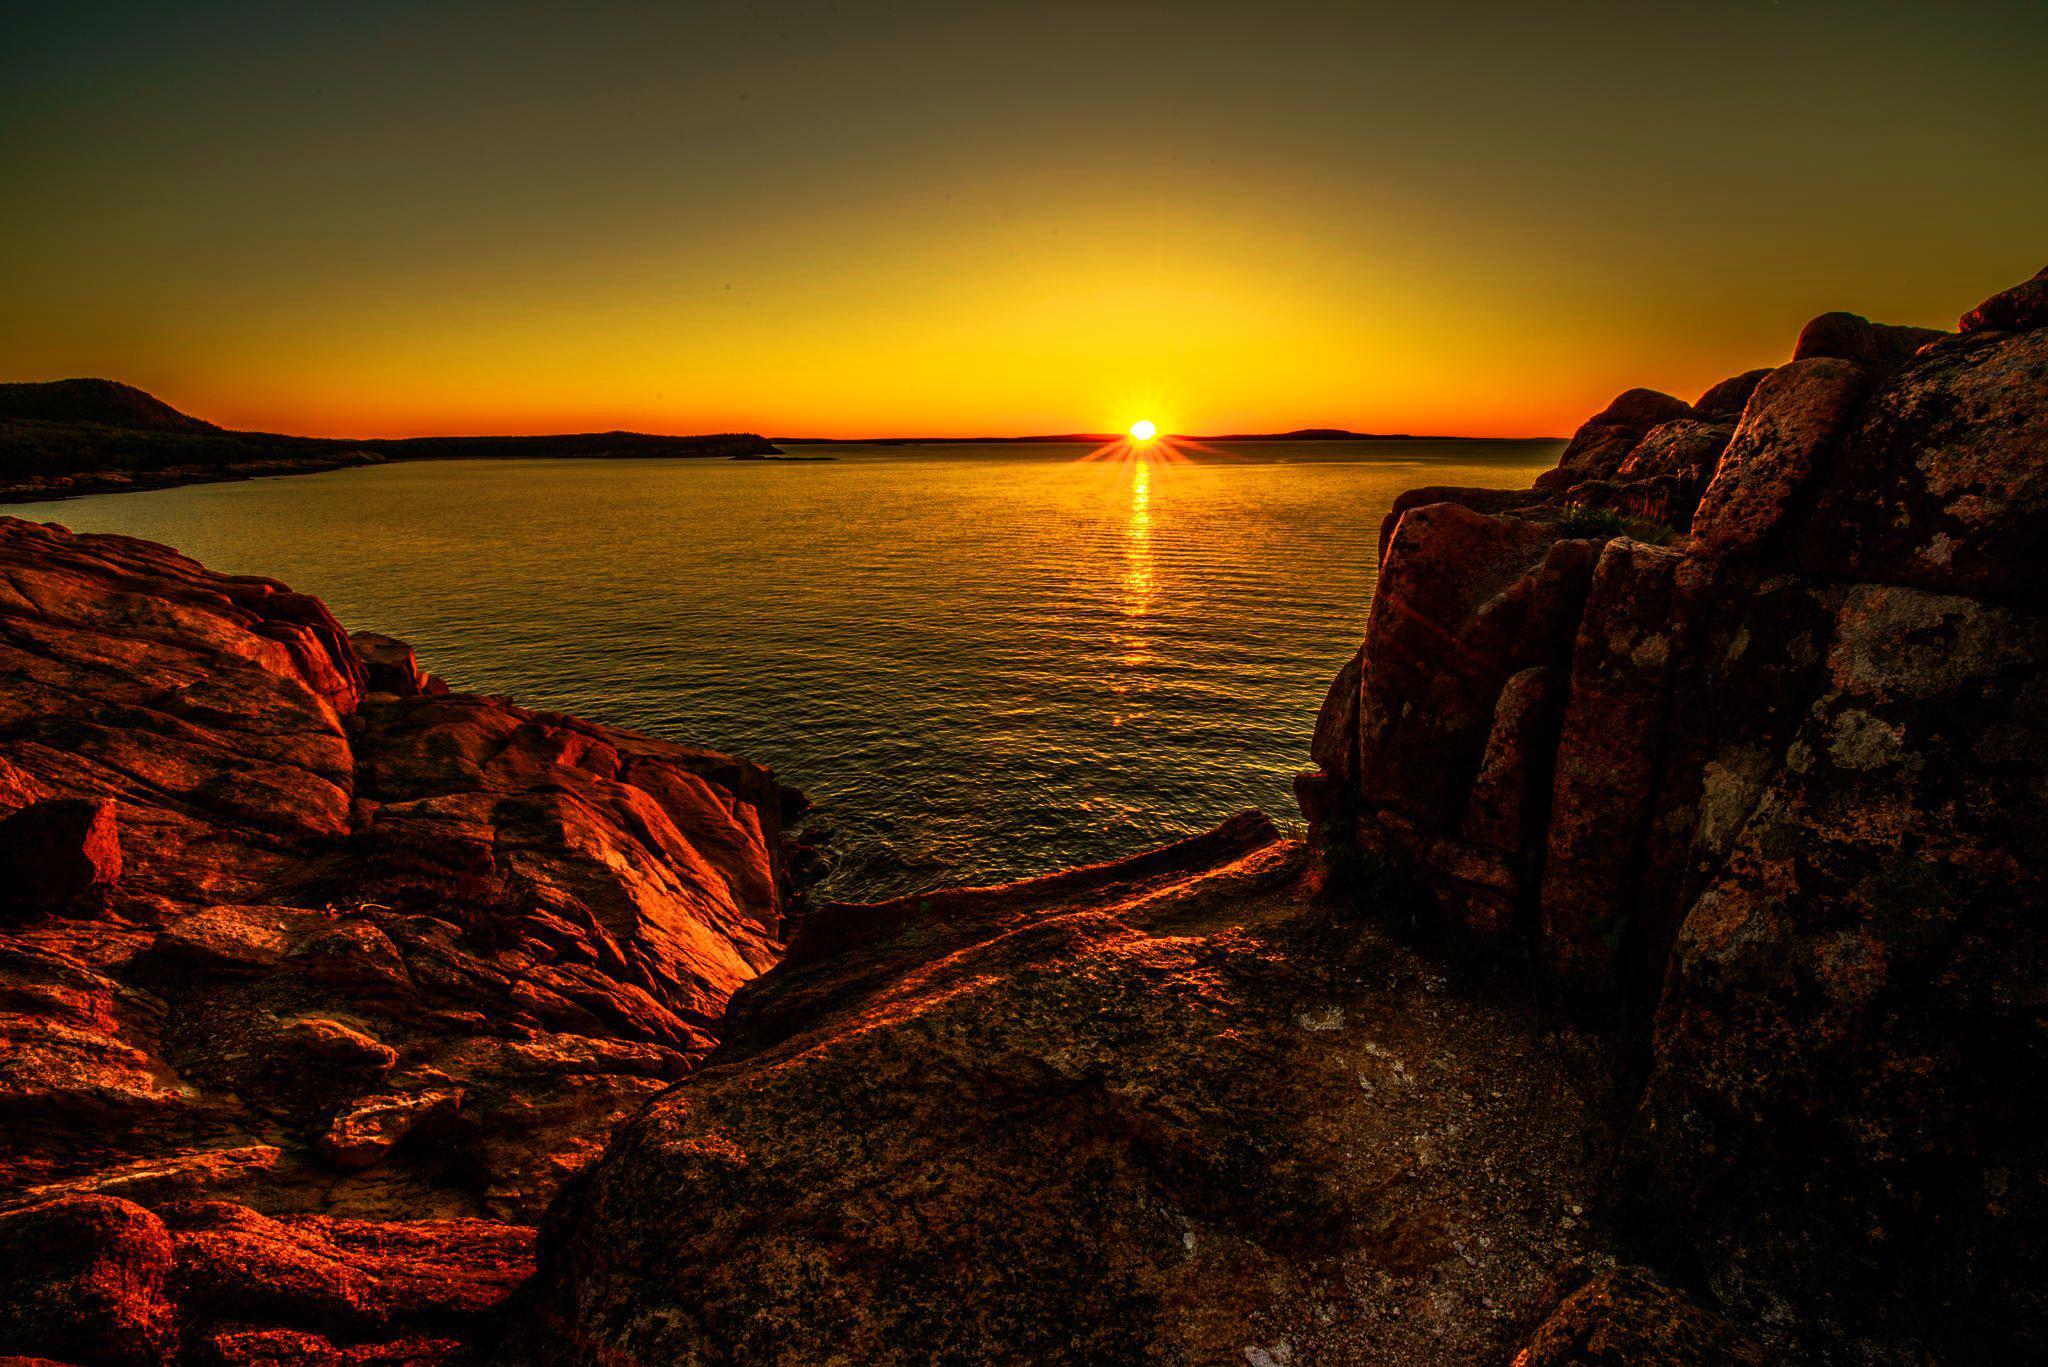 Sunset at acadia national park HQ WALLPAPER   91219 2048x1367